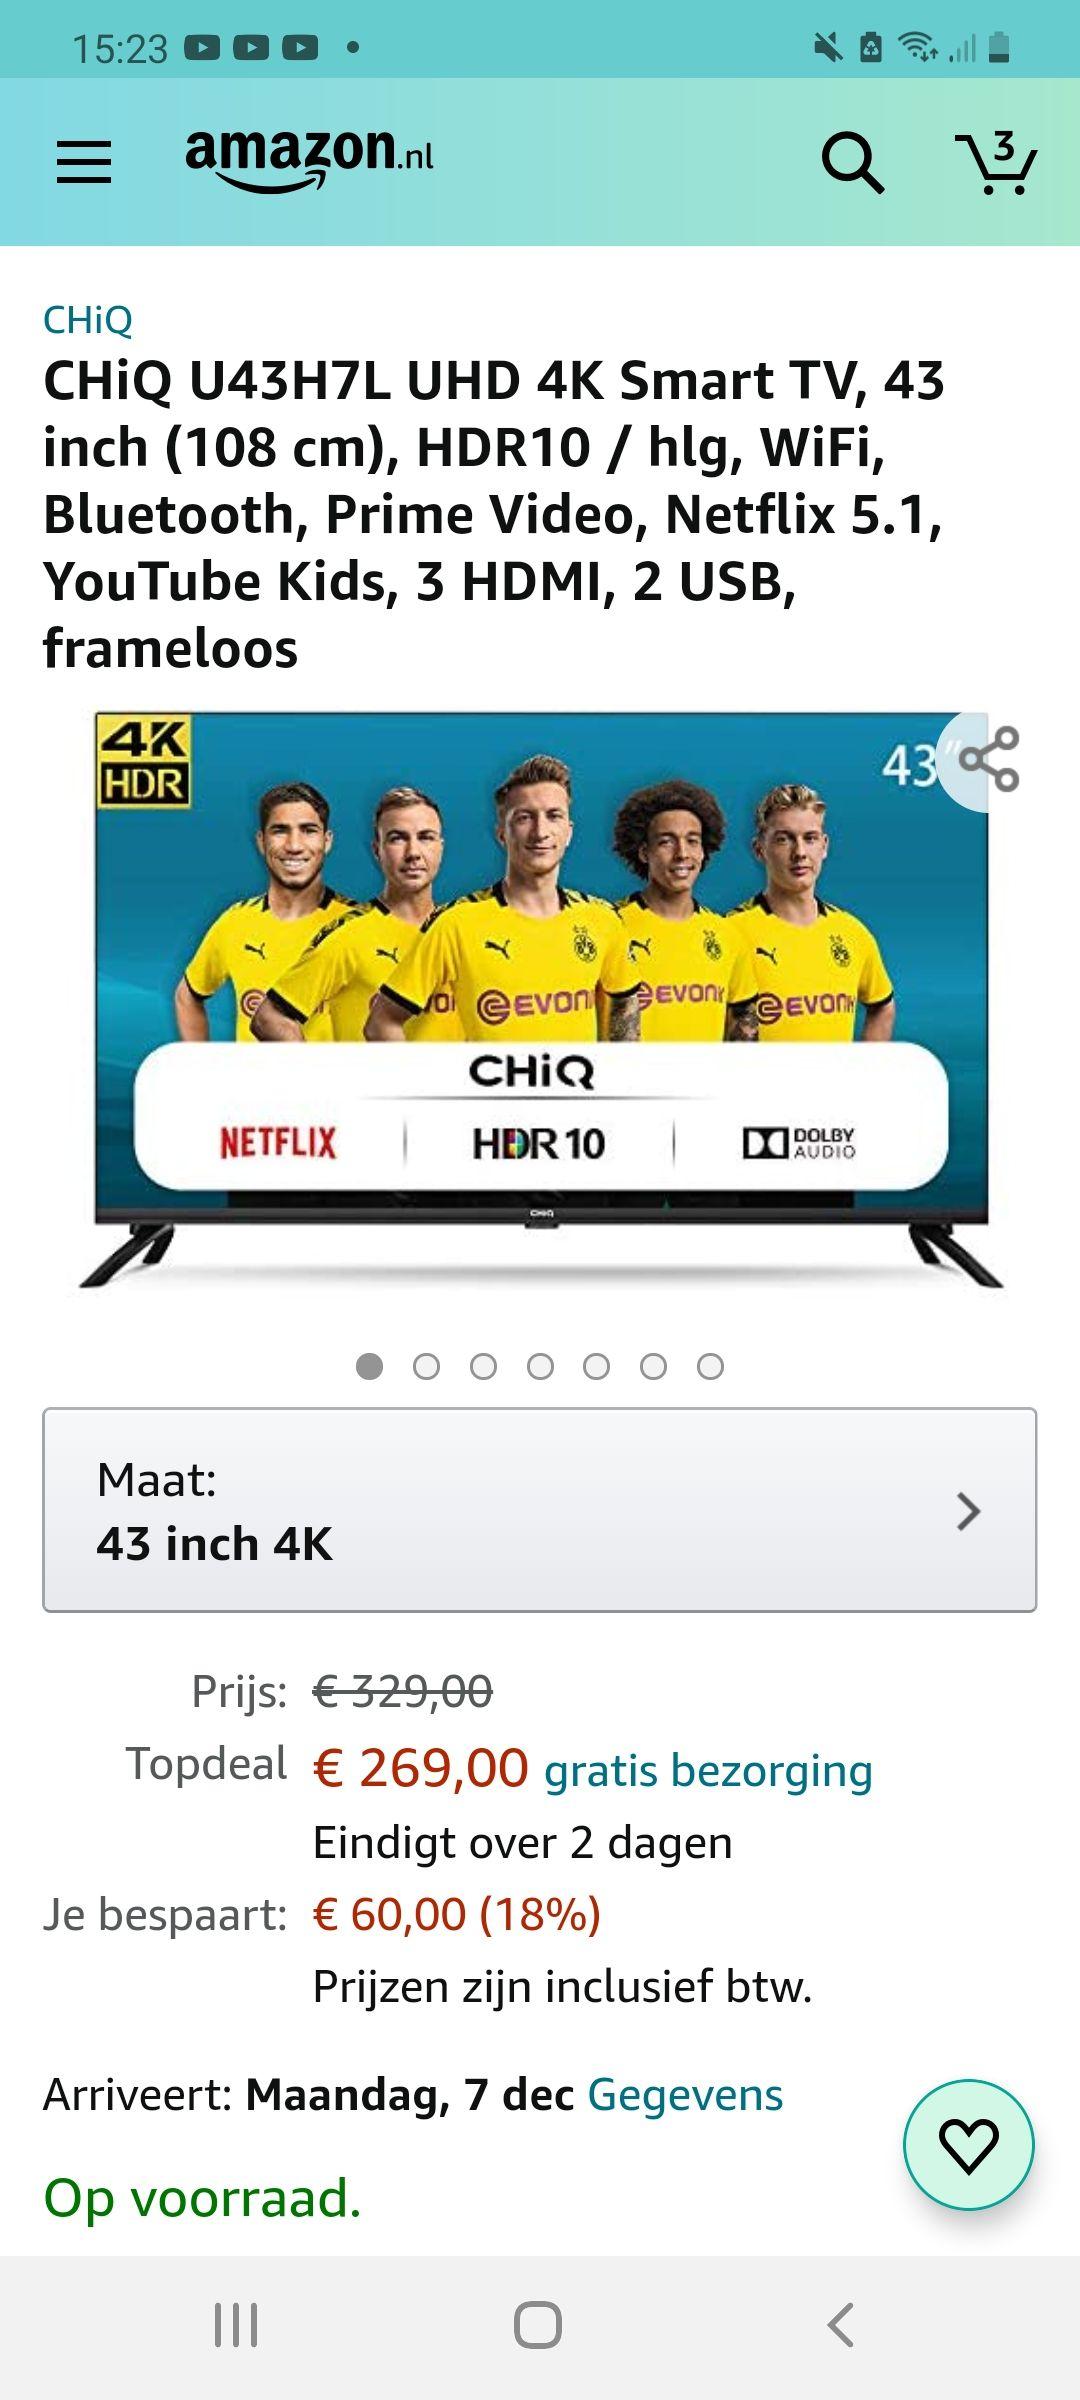 CHiQ U43H7L UHD 4K Smart TV, 43 inch (108 cm), HDR10 / hlg, WiFi, Bluetooth